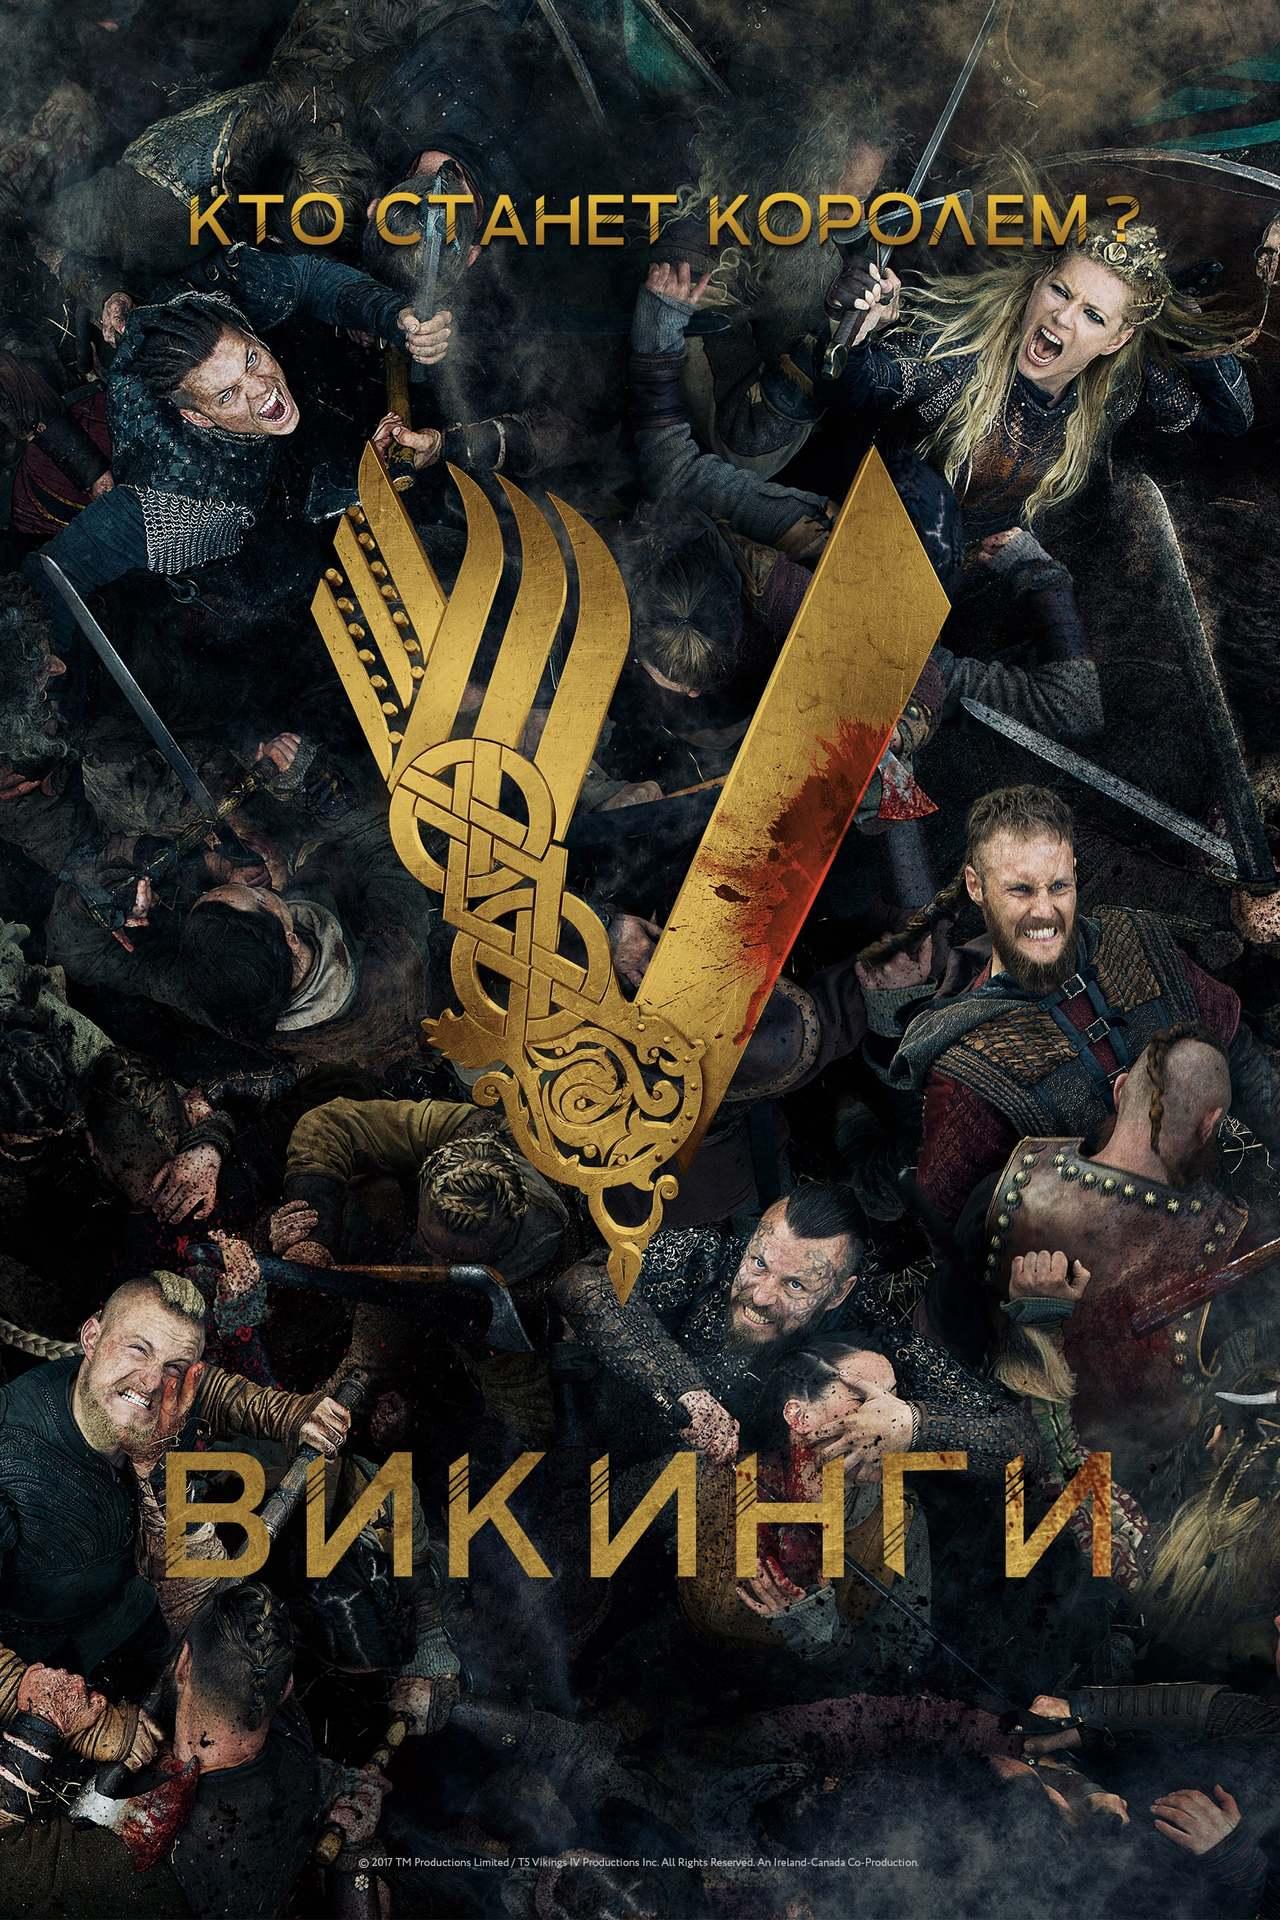 Постер фильма Викинги Vikings 2013